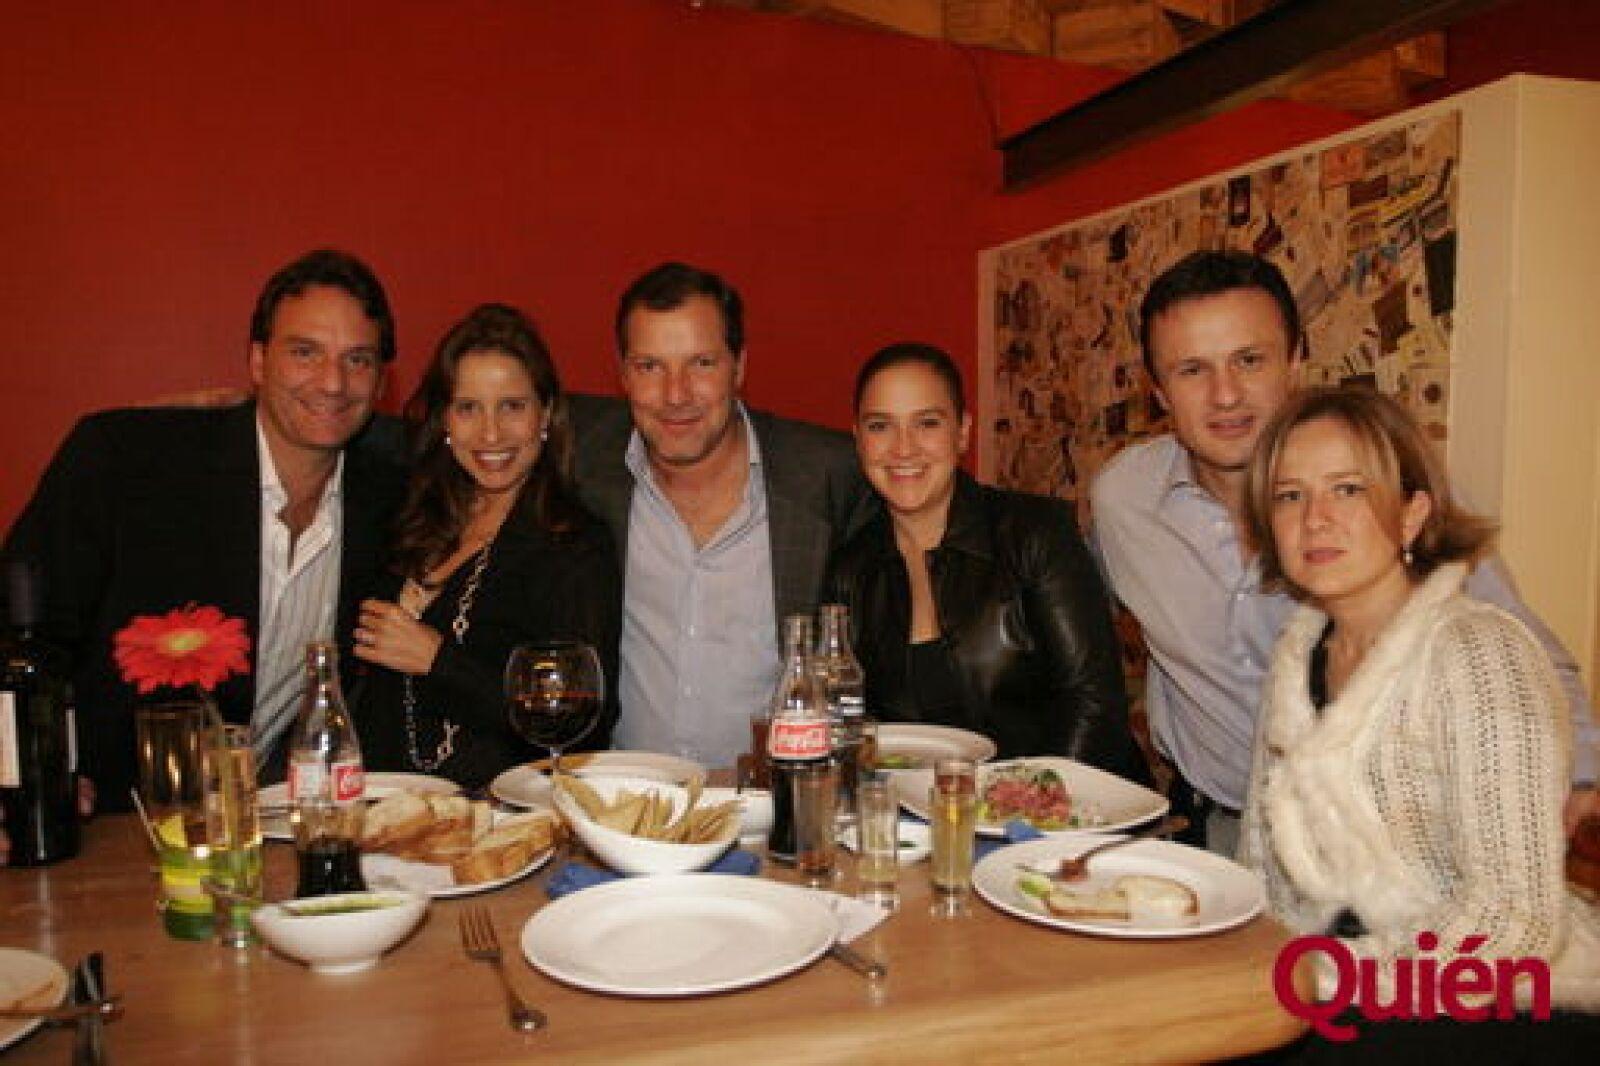 Guillaume Martin, Galia Rodríguez, Jorge Forastieri, Ana Forastieri, Gabriela Esparza, Carlos Esparza